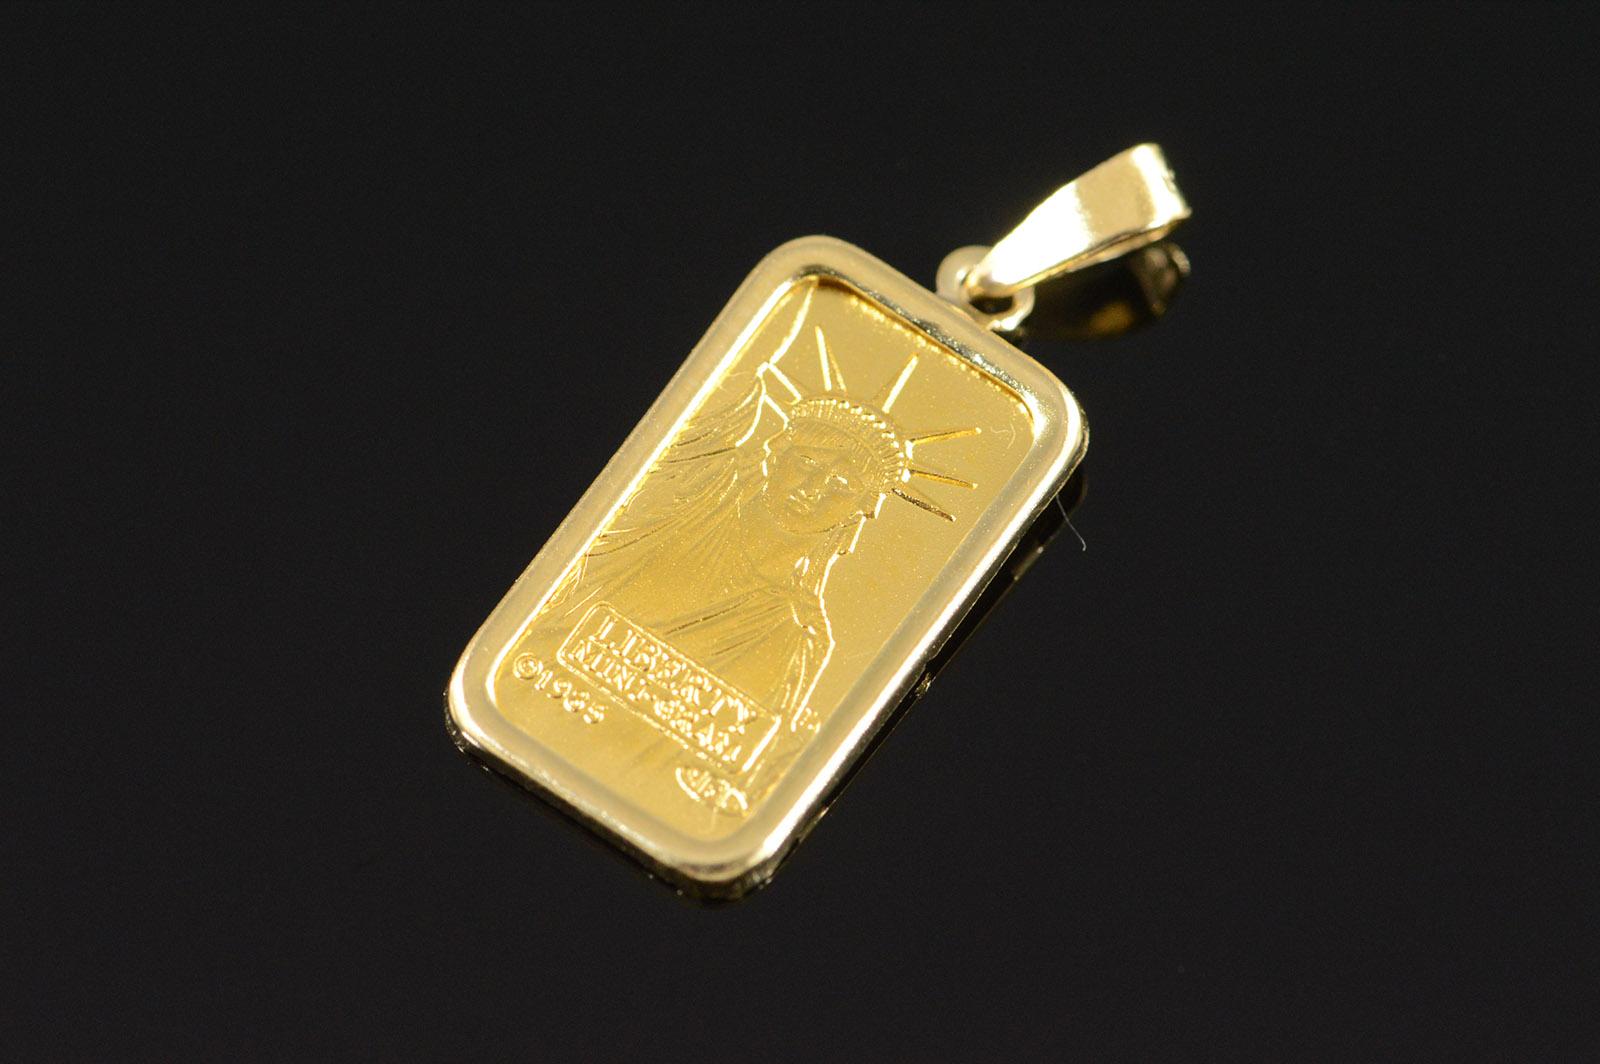 14k 13g 1 gram 999 pure gold bar yellow gold pendant property room image 1 of 4 aloadofball Images